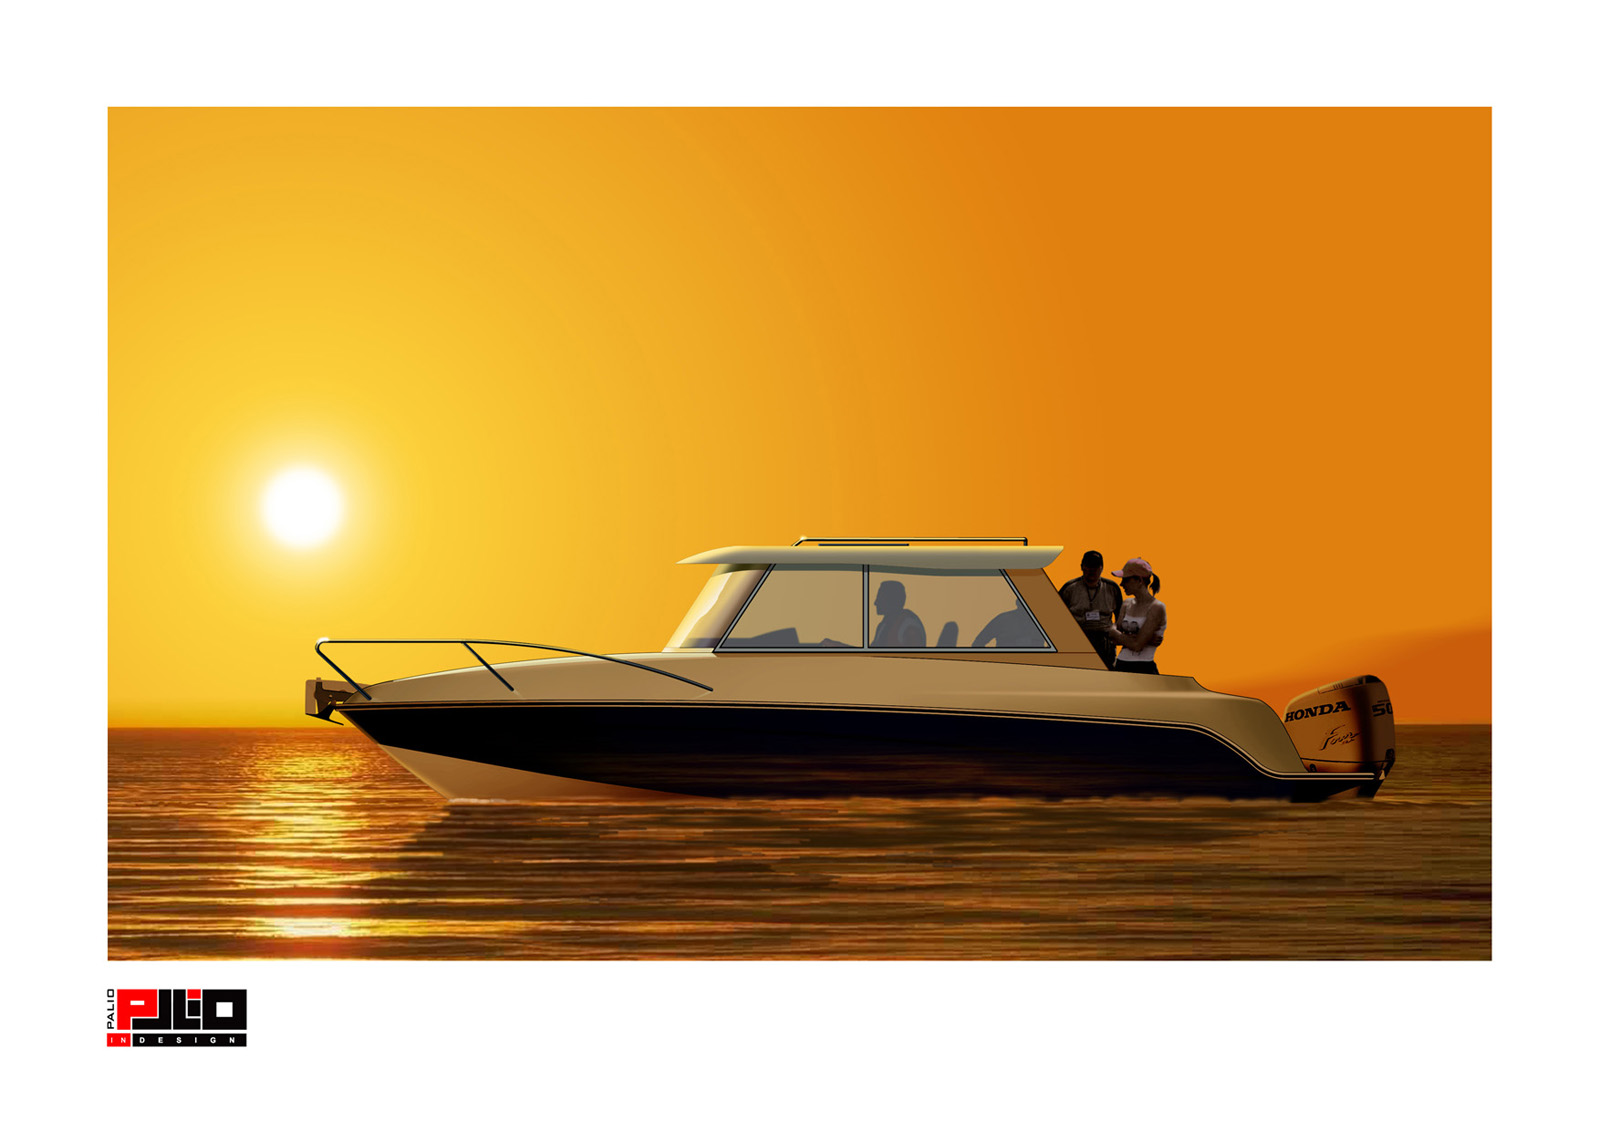 Закат и море, яхта, корабль